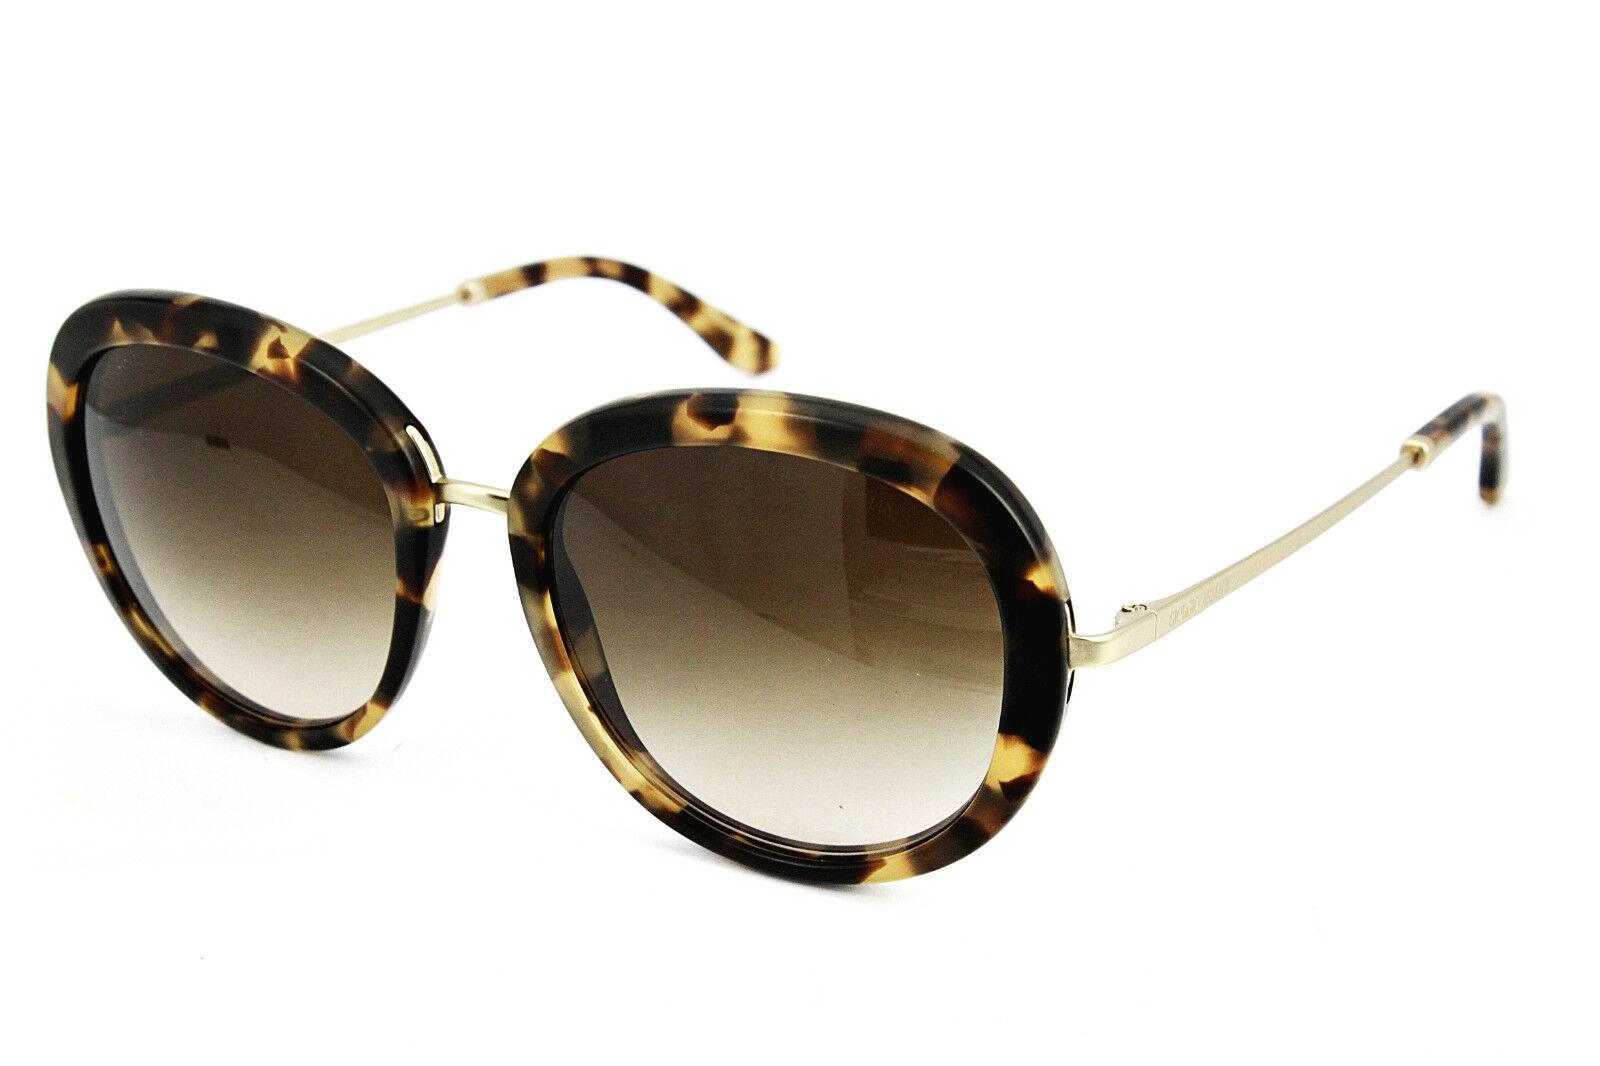 Giorgio Armani Sonnenbrille   Sunglasses AR8040 5282 13 5418 140 3N    297(15) | Niedriger Preis